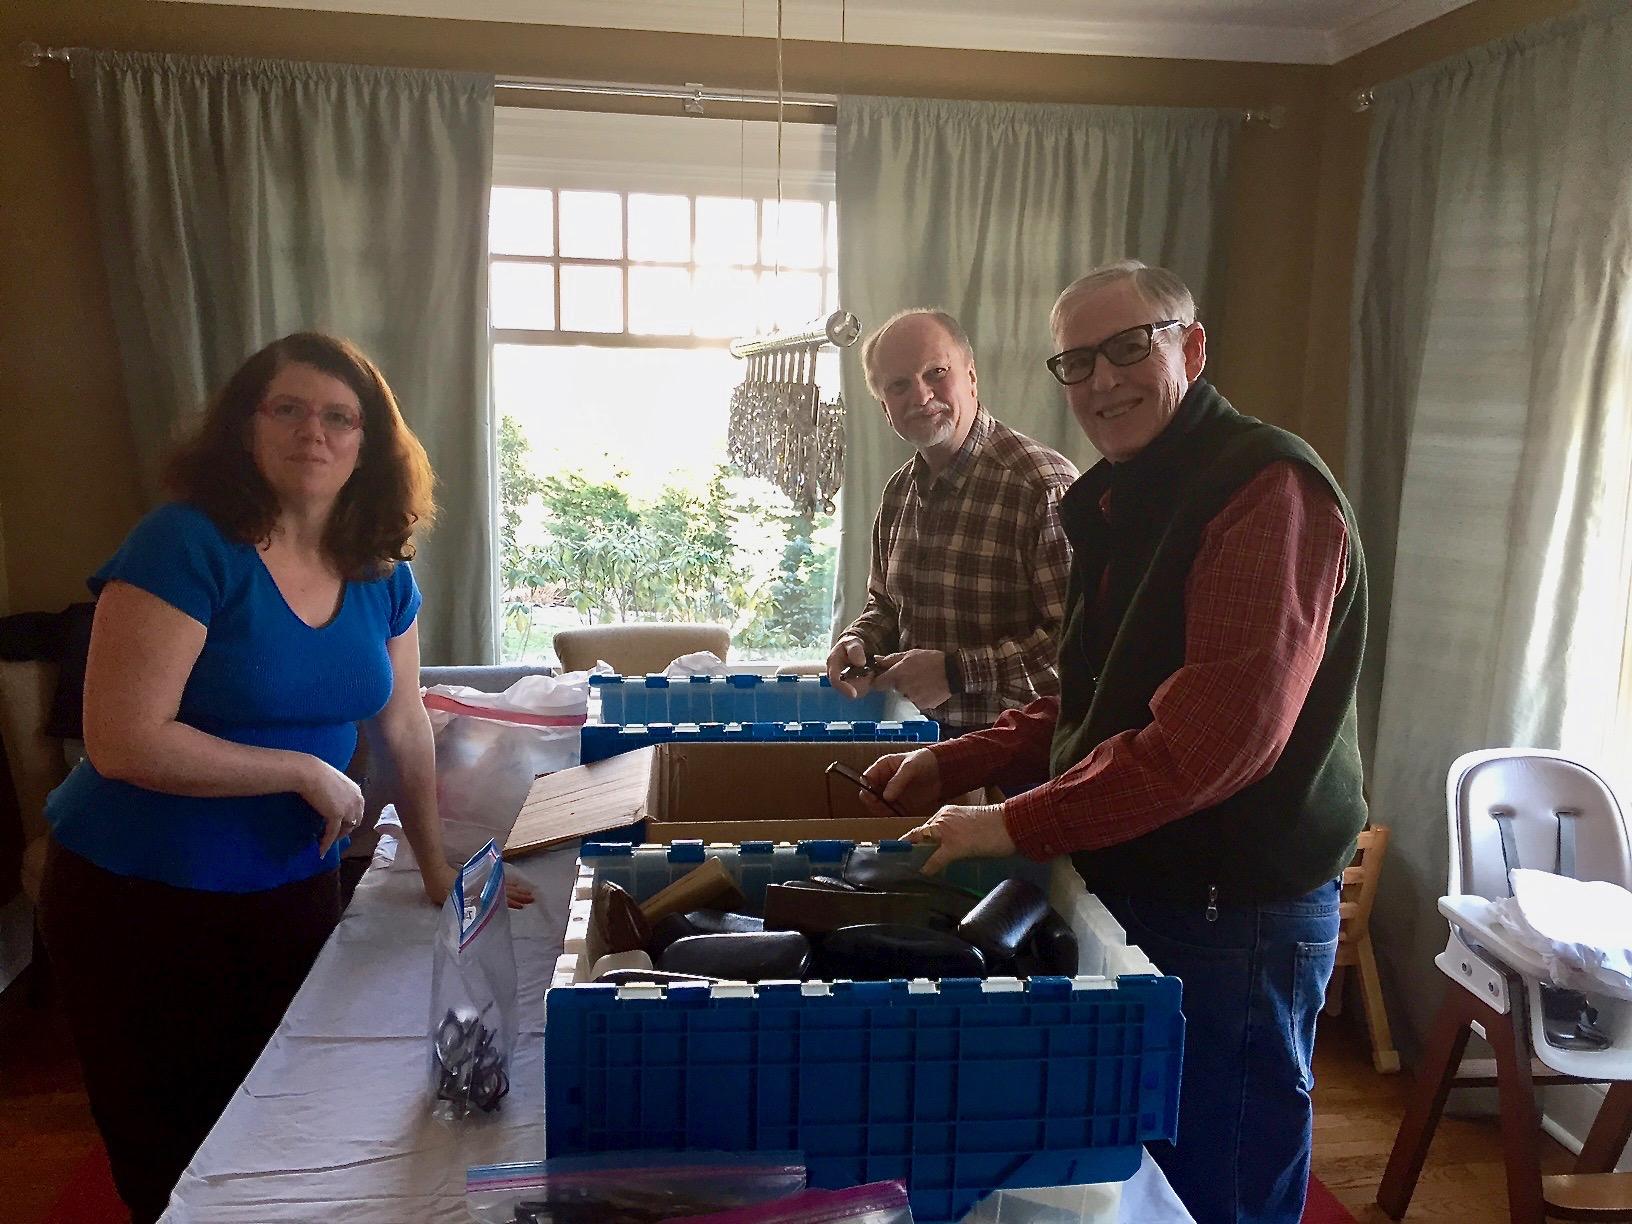 Summit Lions members  (from left)  Rhonda Zampetti, Walter Wojcik and Peter Loeser sort glasses as part of the club's eyeglass recycling program.